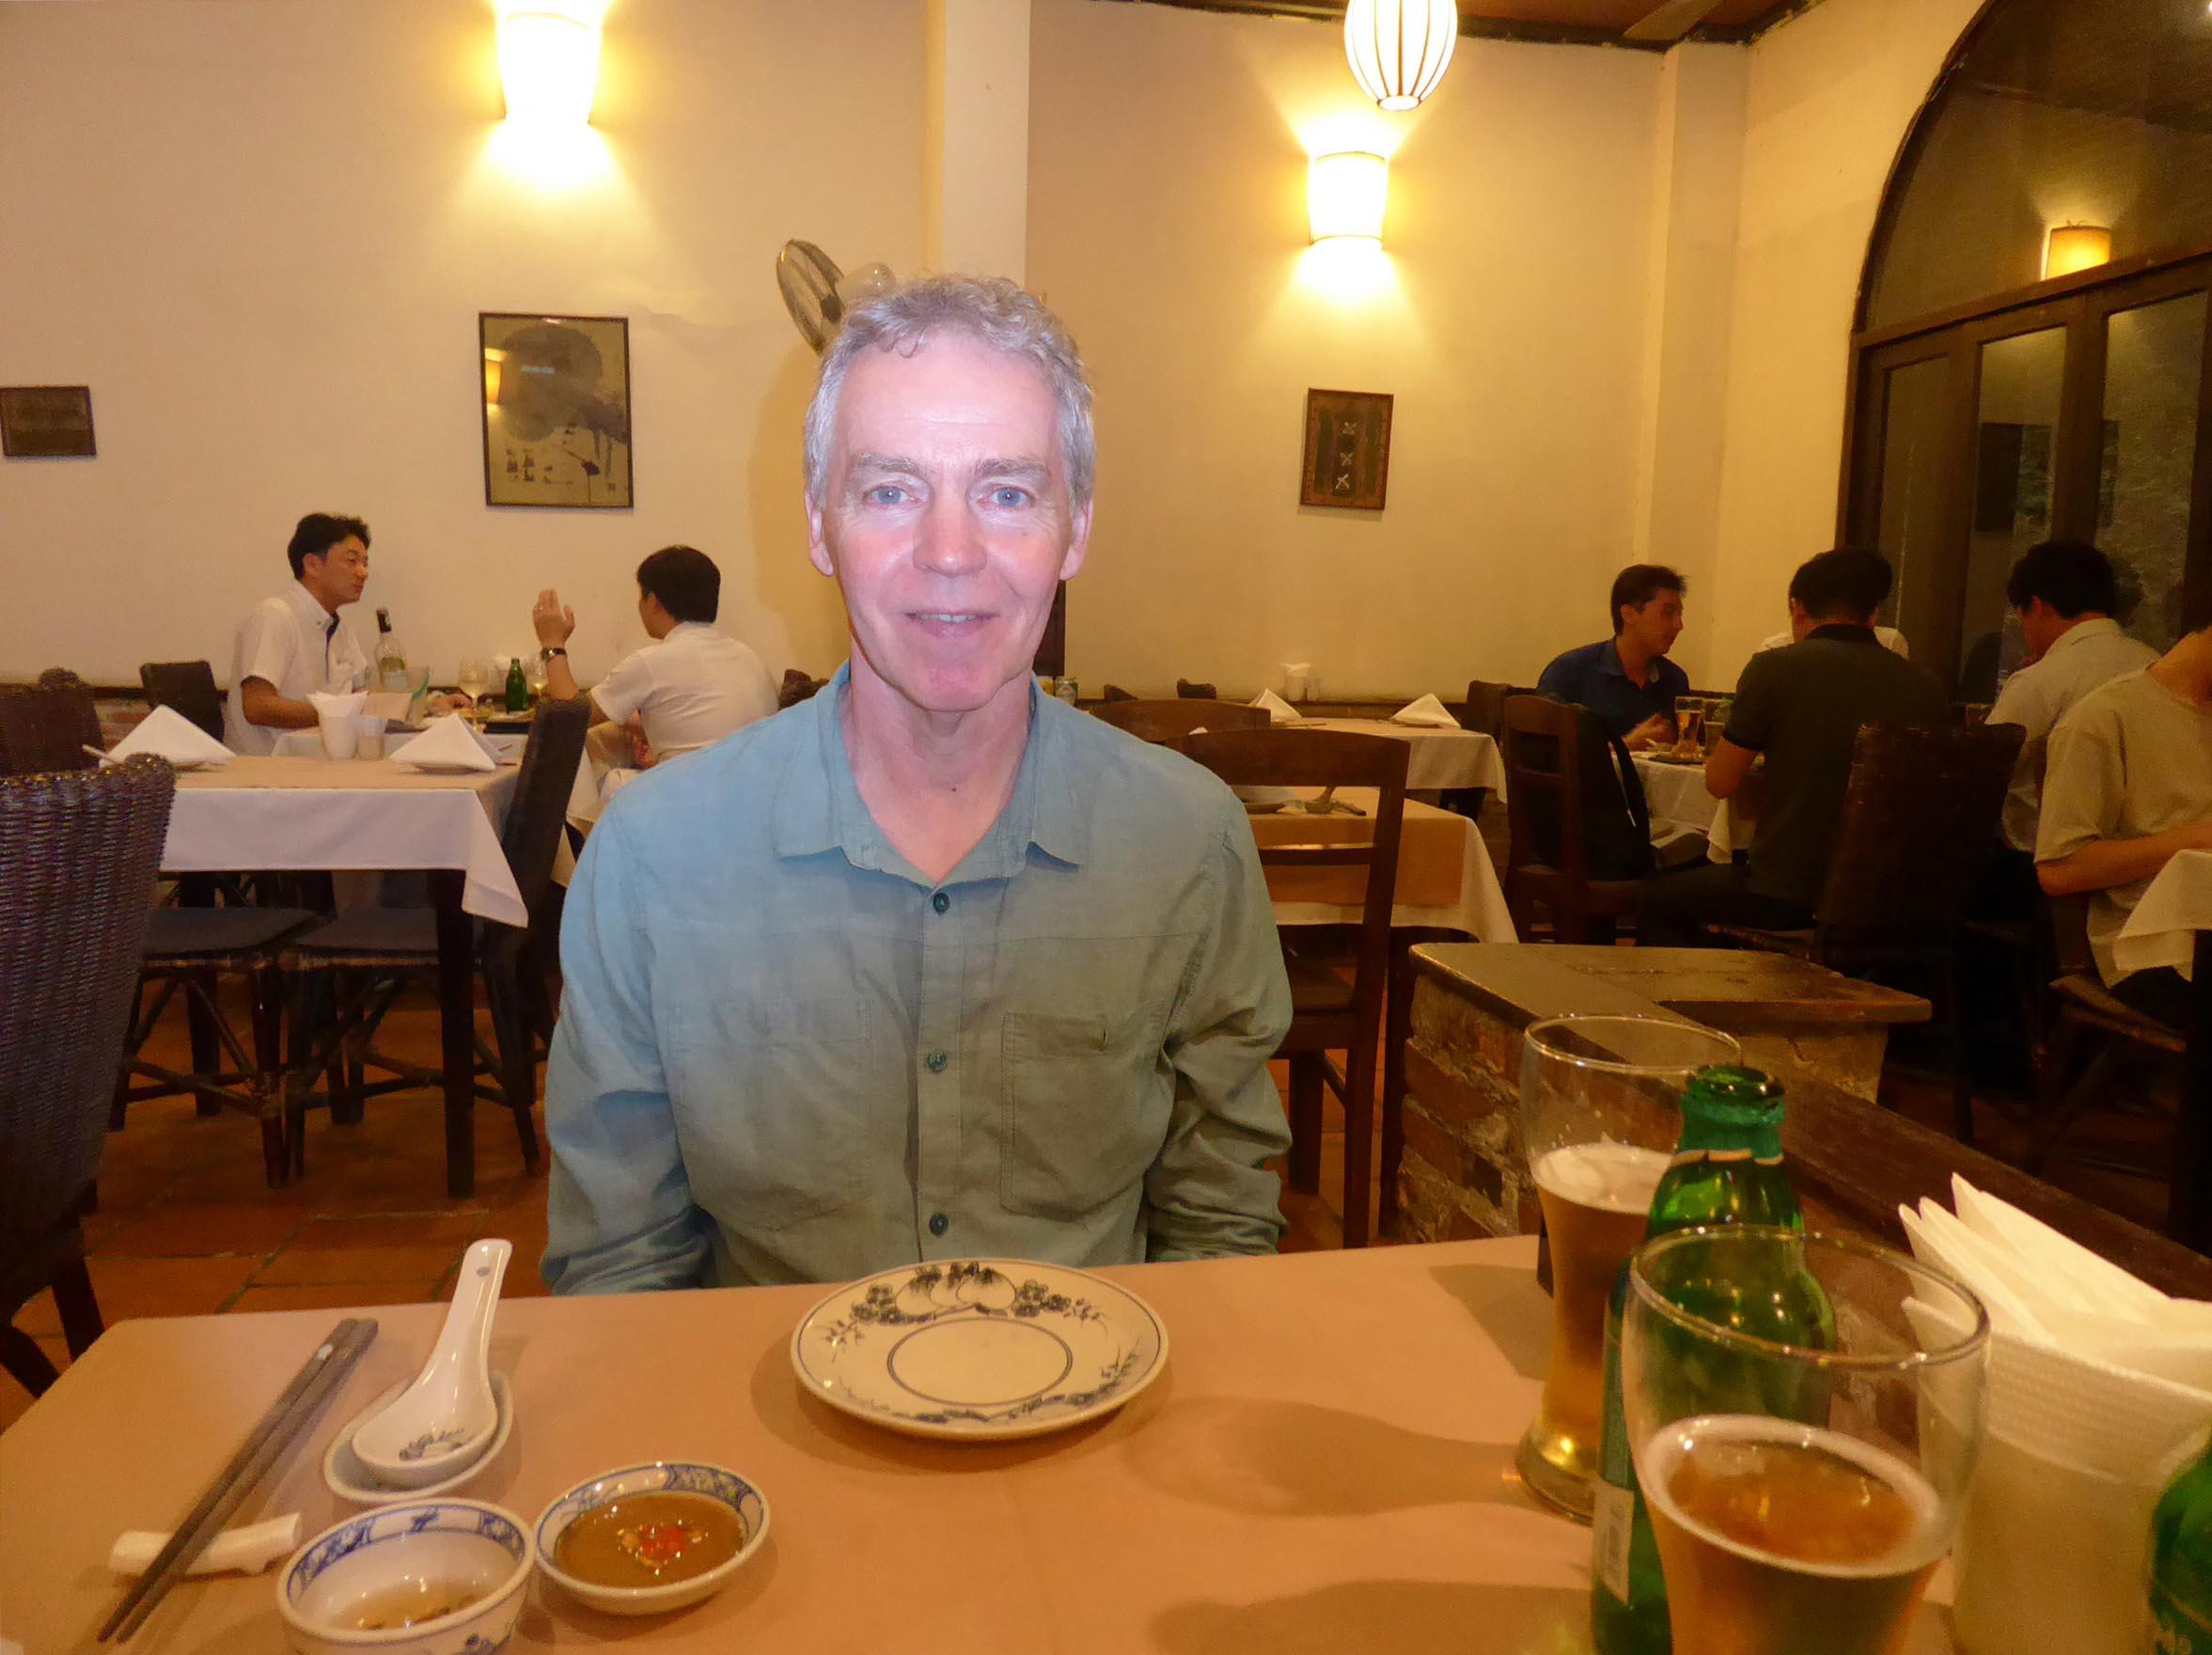 Man at a restaurant table